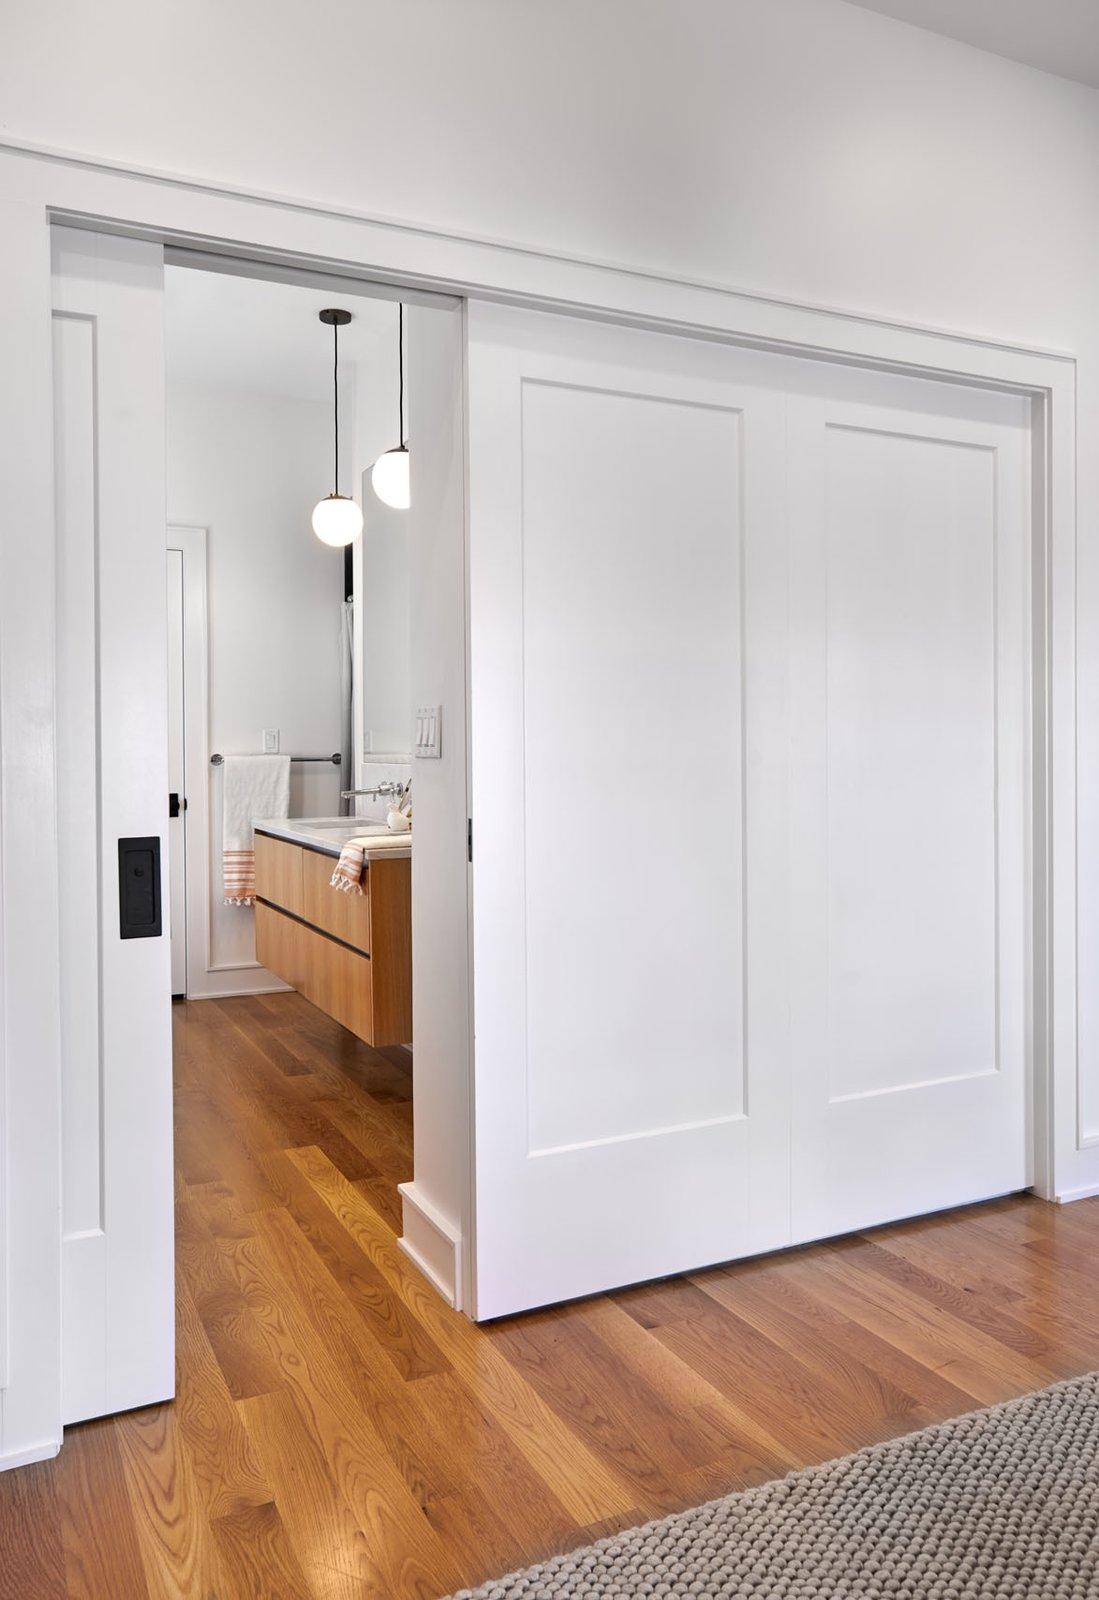 Doors, Interior, Wood, and Sliding Door Type Master Bathroom  The Historic Ely Building